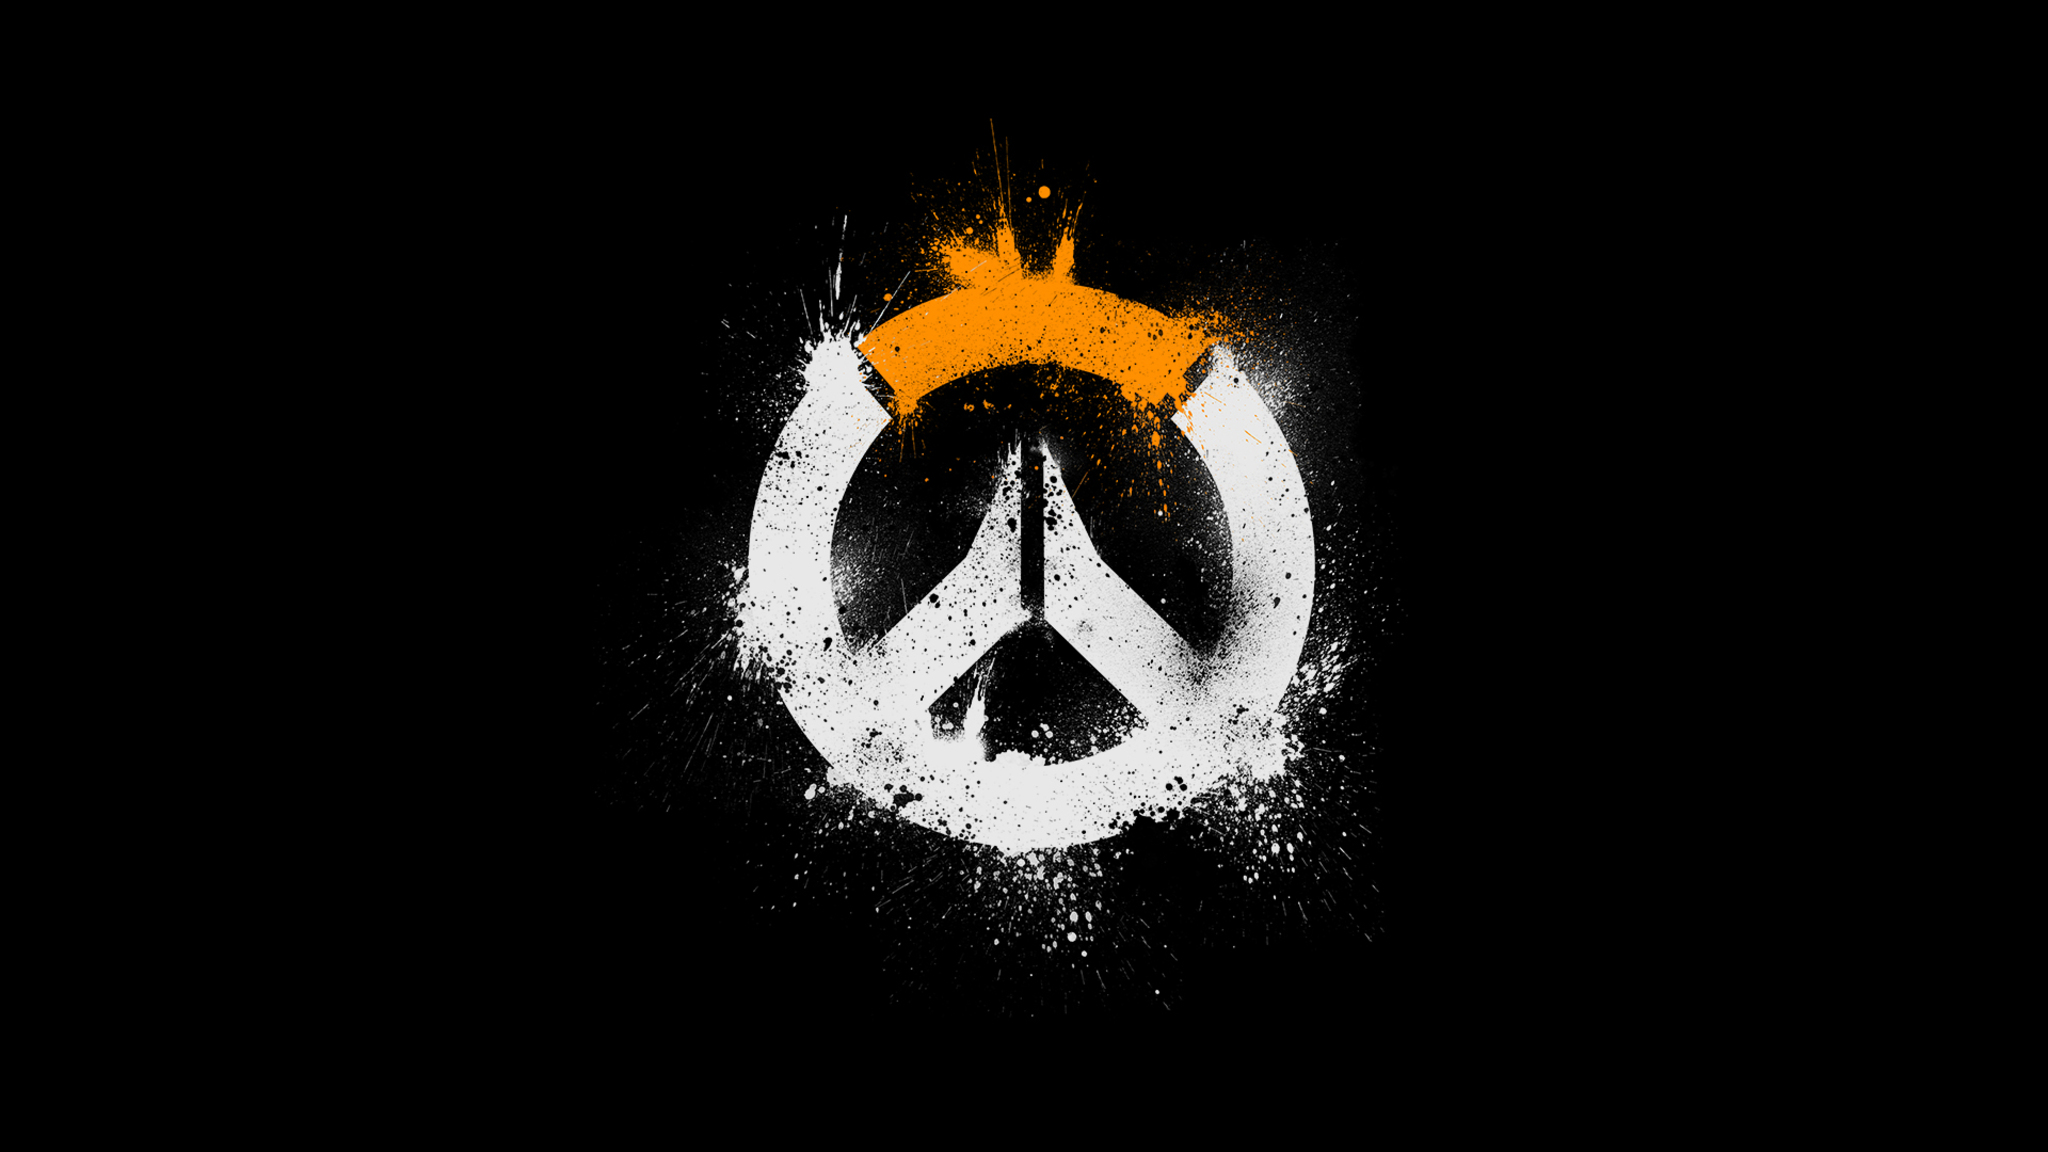 Cute Wallpapers  2048x1152 Overwatch Logo Hd 2048x1152 Resolution Hd 4k